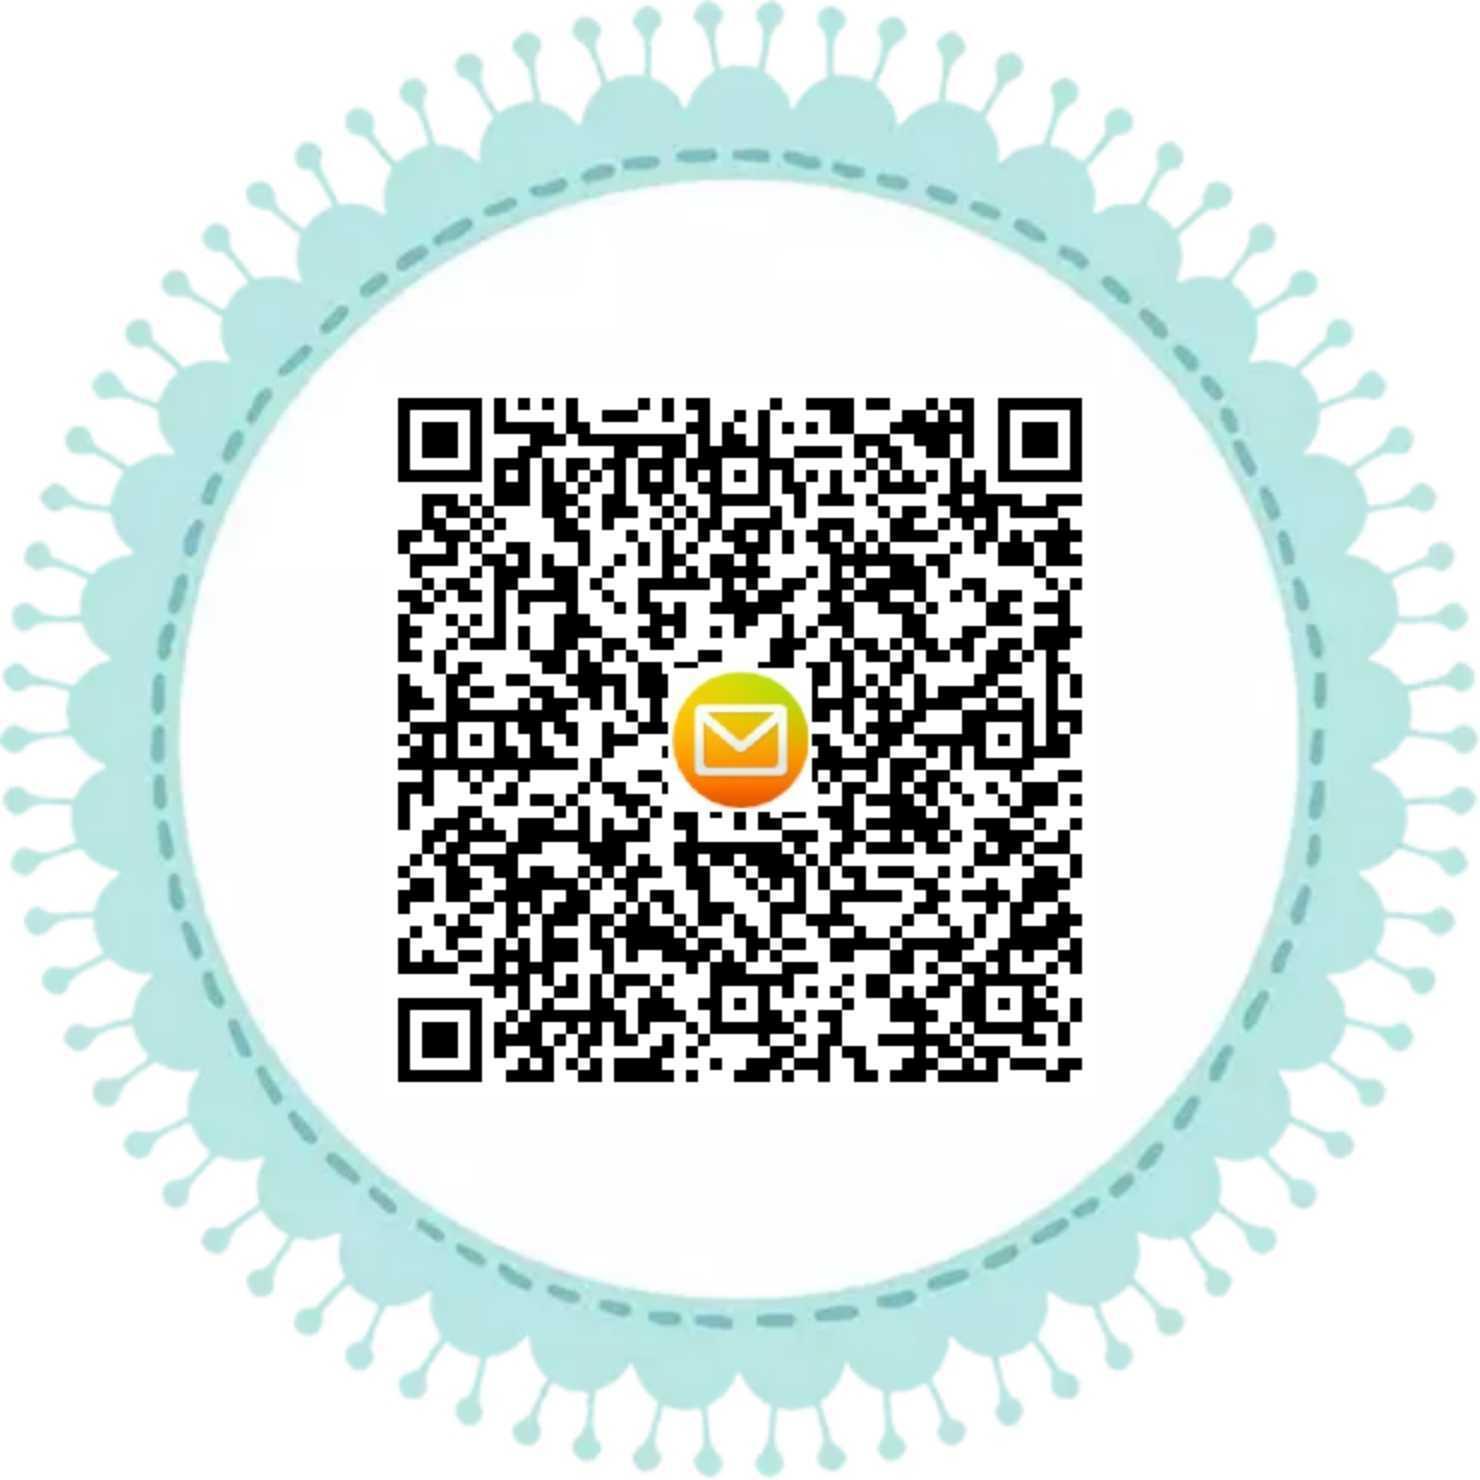 http://www.58100.com/index/detail/721606